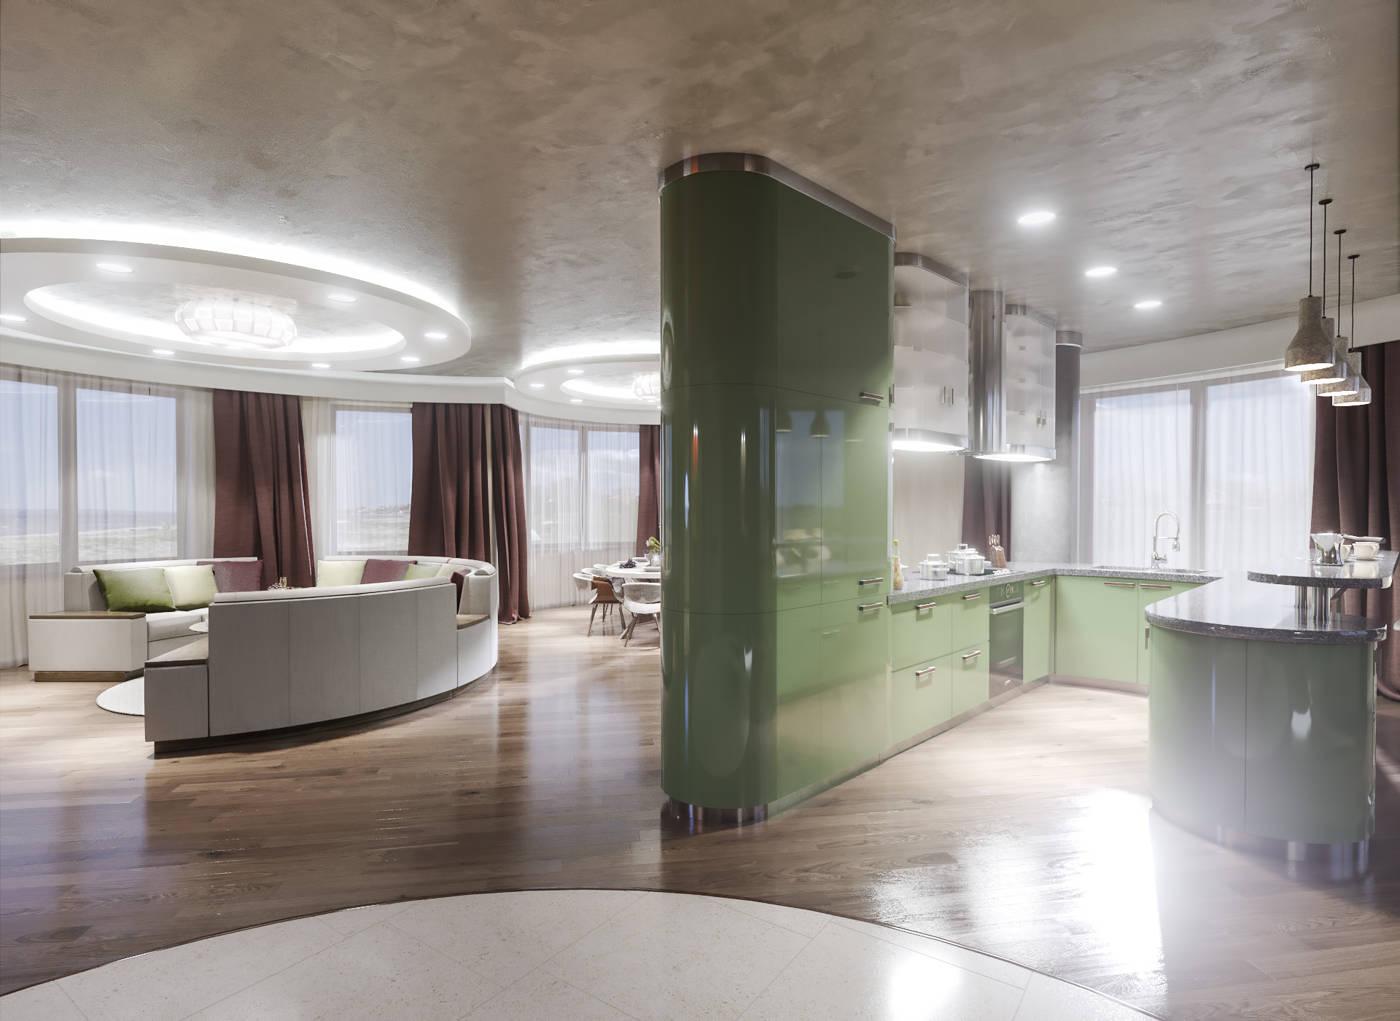 Дизайн кухни в квартире Киев островная кухня зеленая, модерн